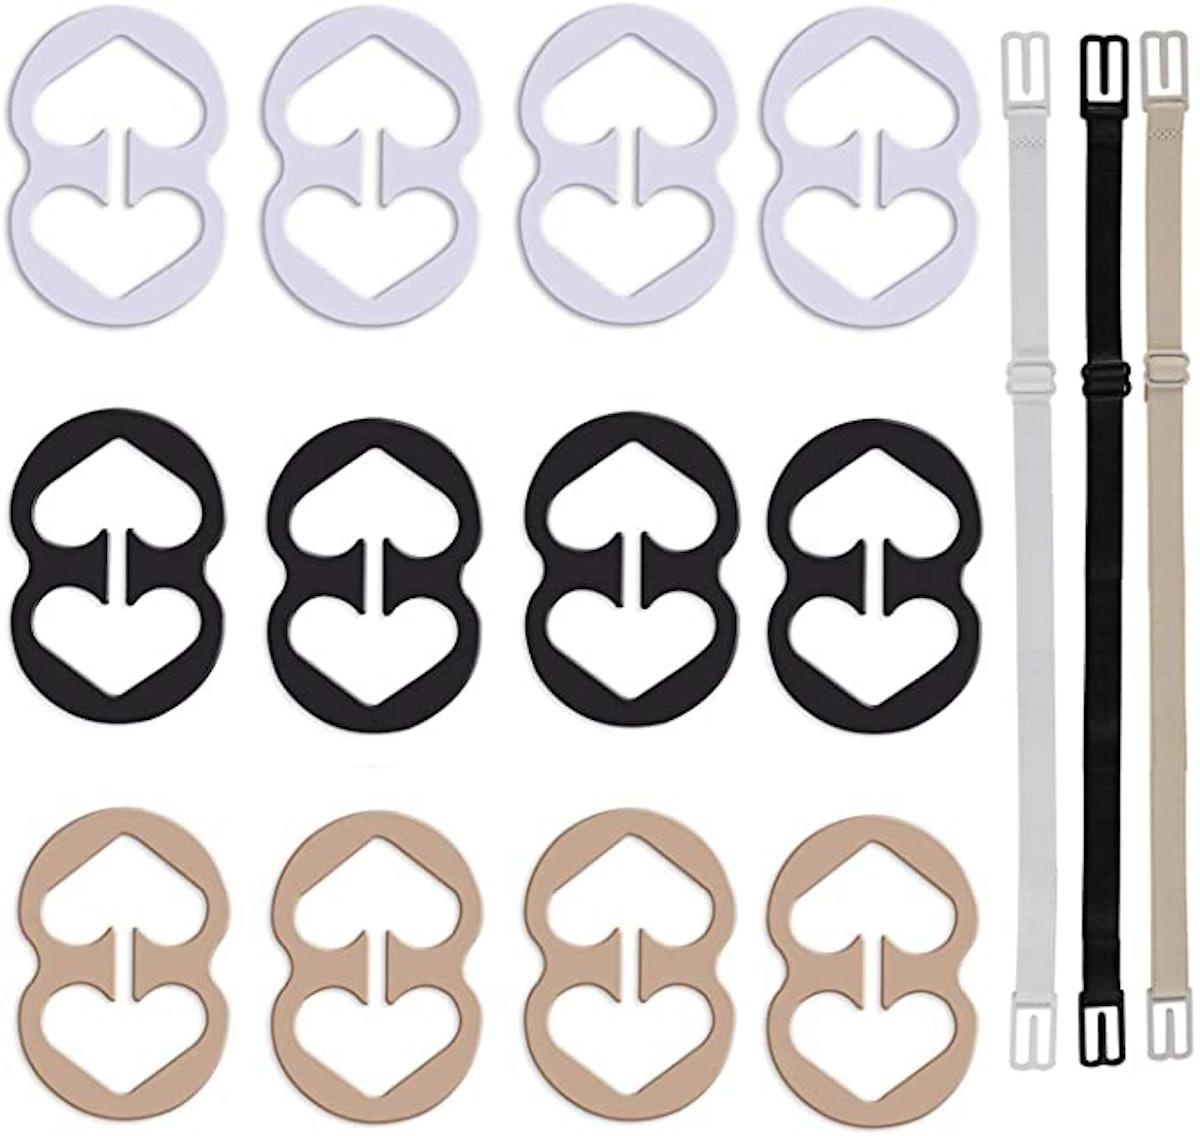 W-Plus Bra Strap Clips (12-Pack)